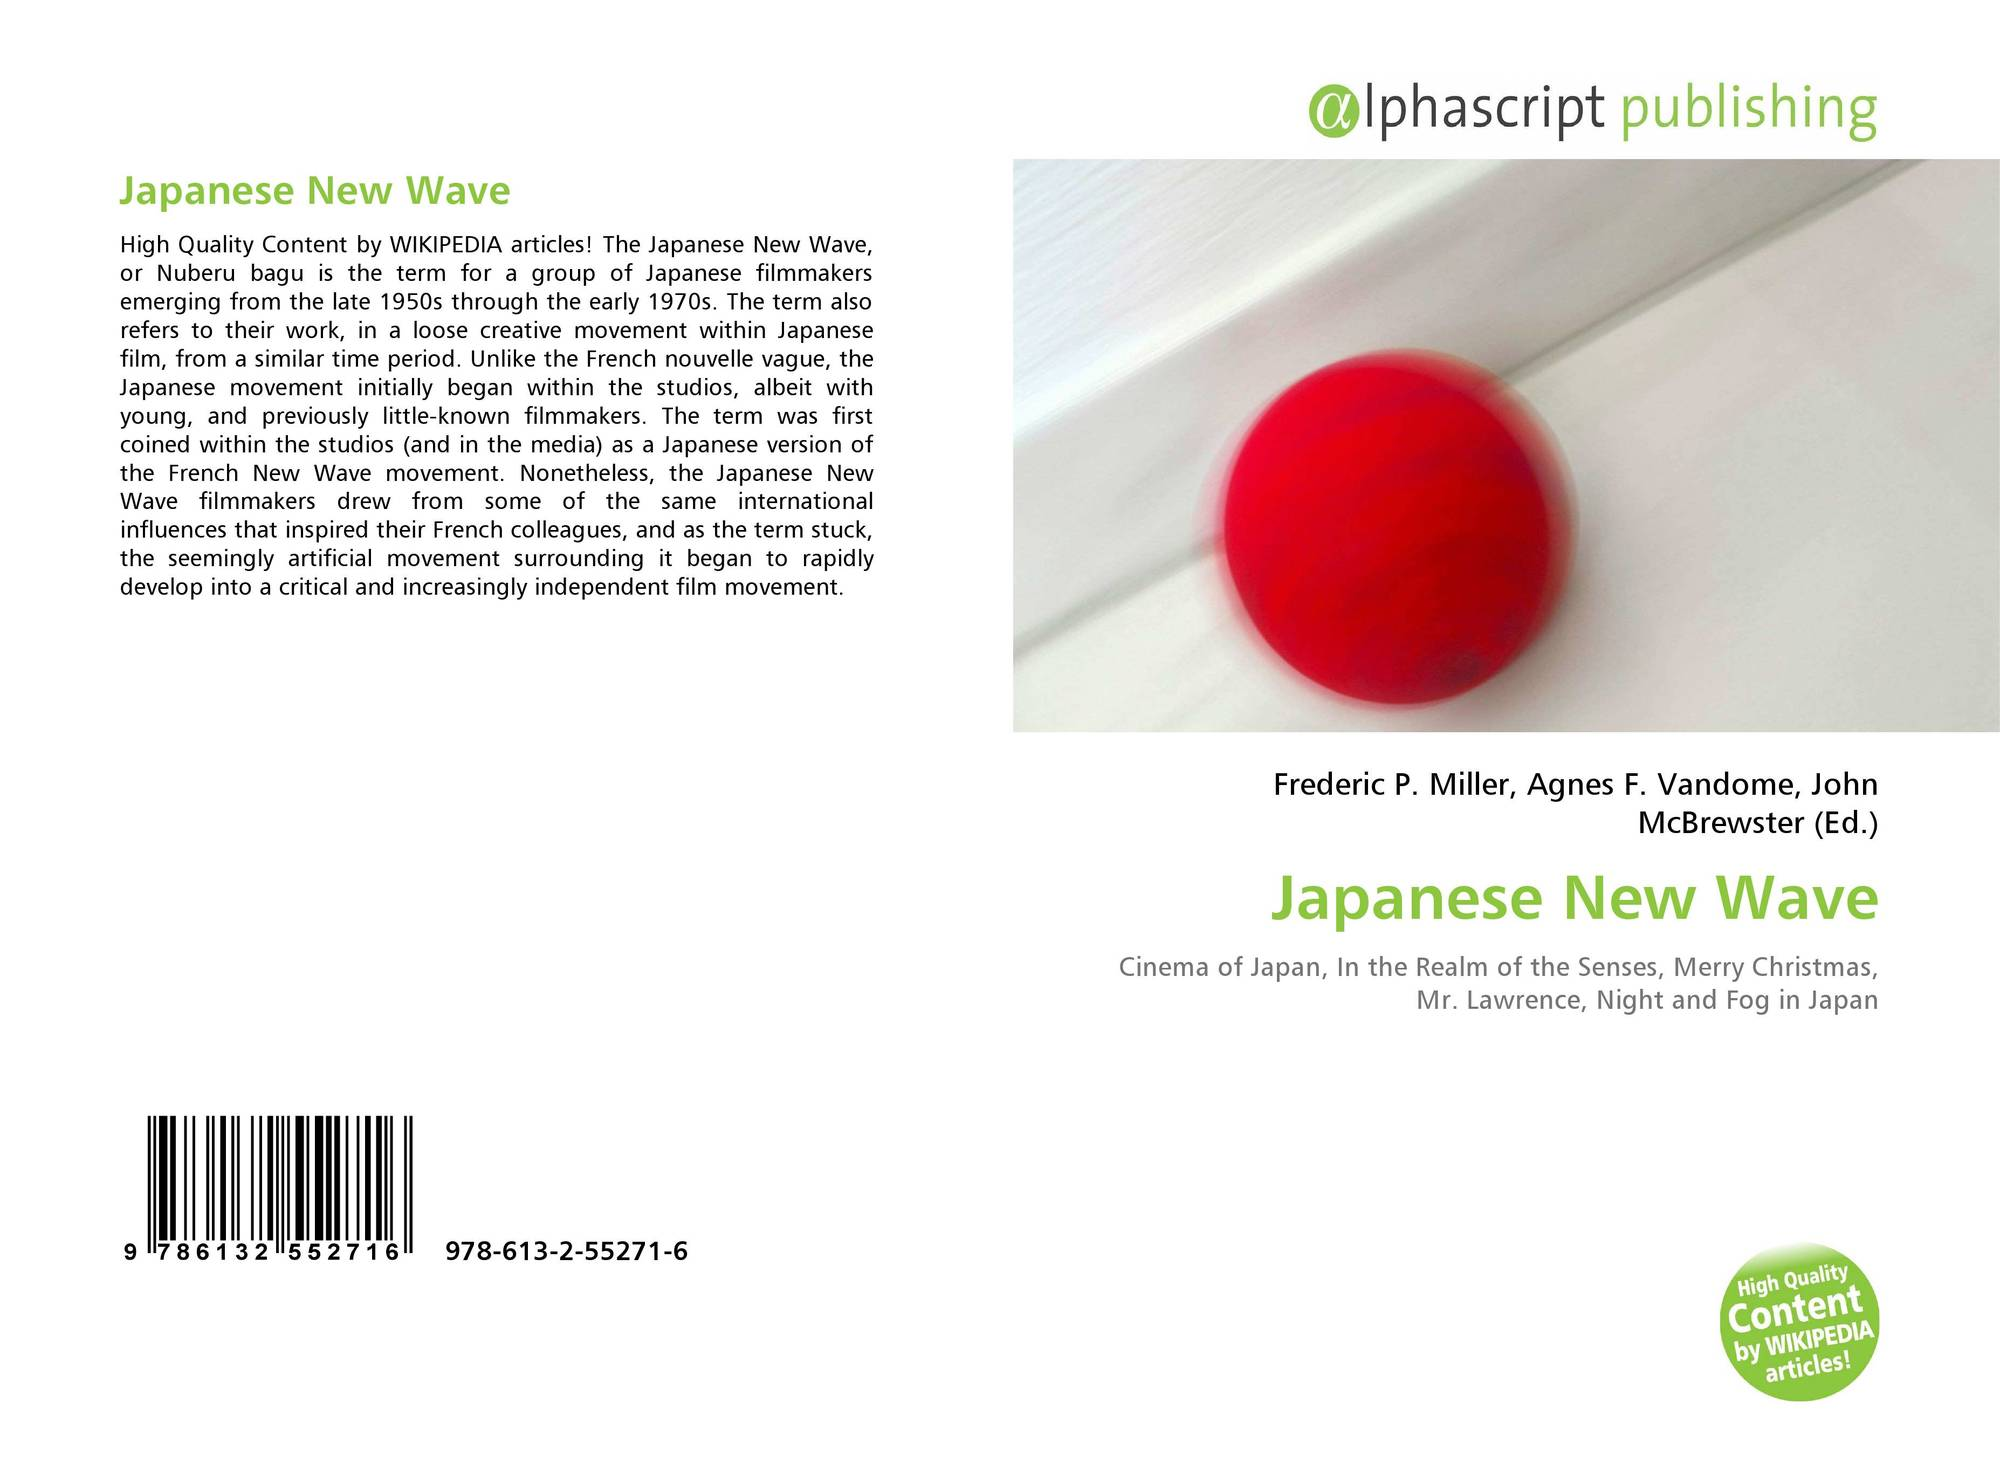 Japanese New Wave, 978-613-2-55271-6, 6132552715 ,9786132552716